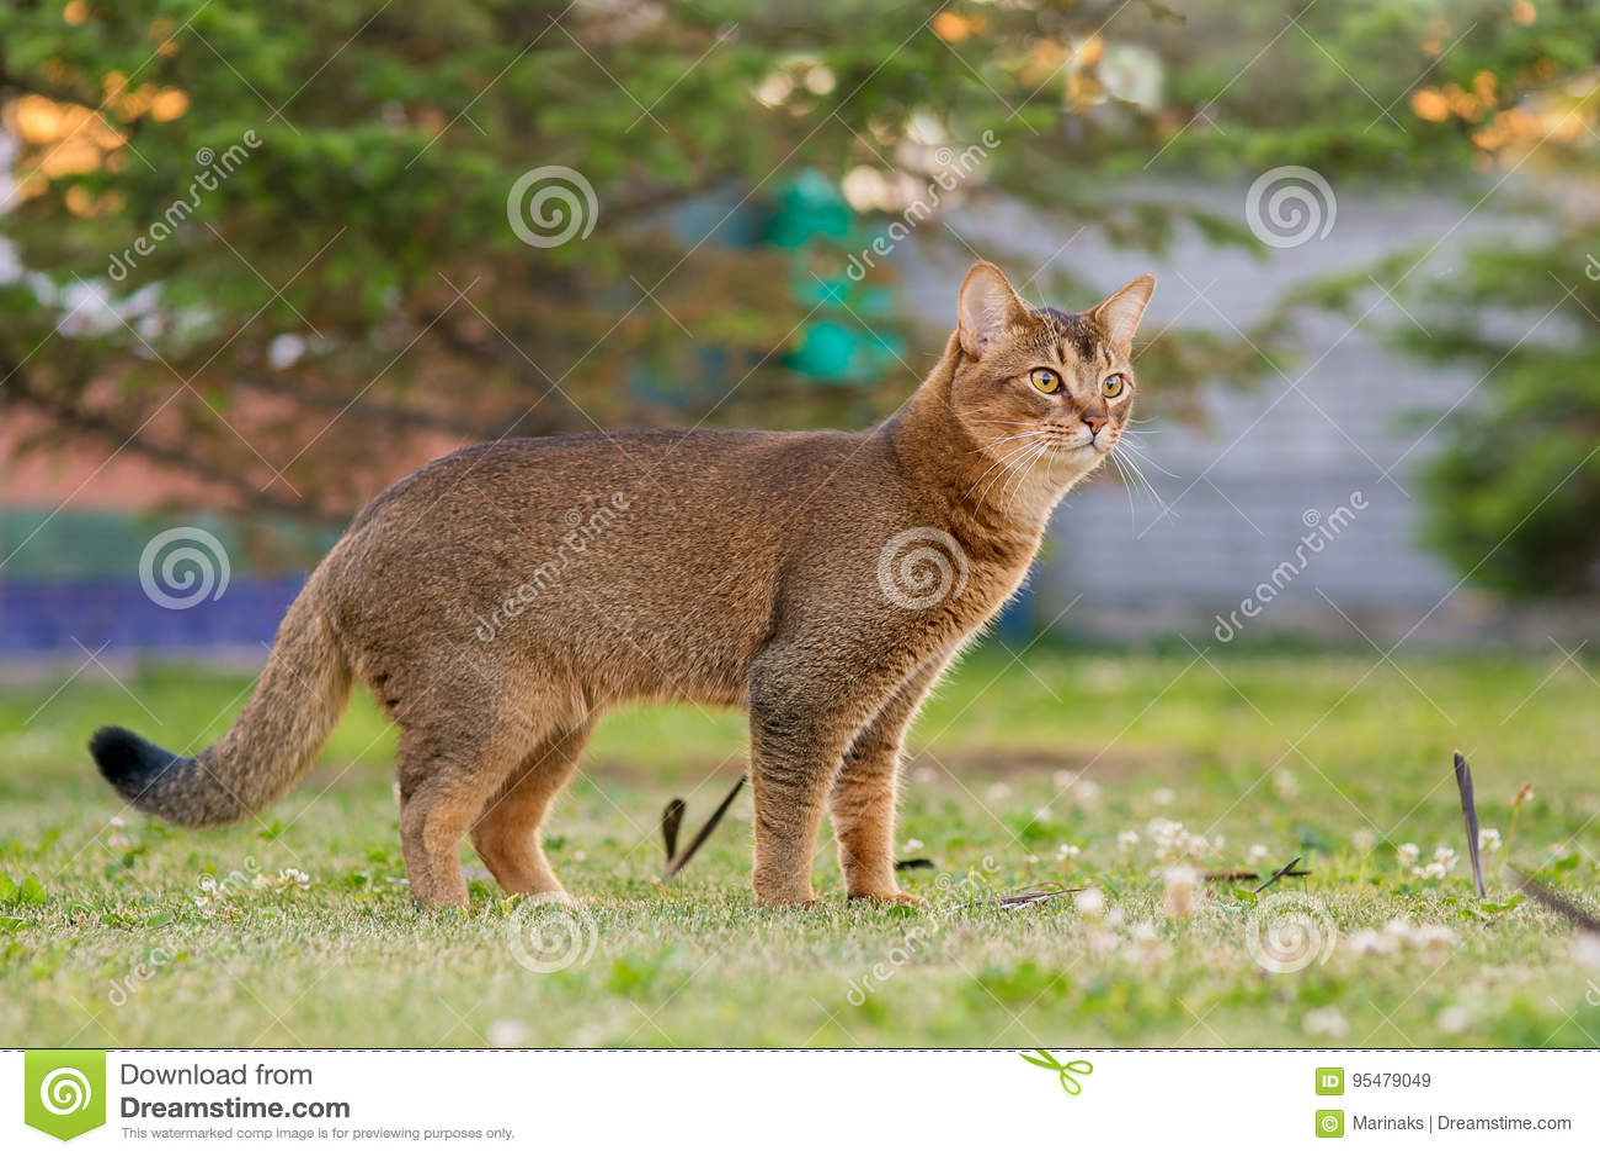 Abisyński kot tropi ptaka